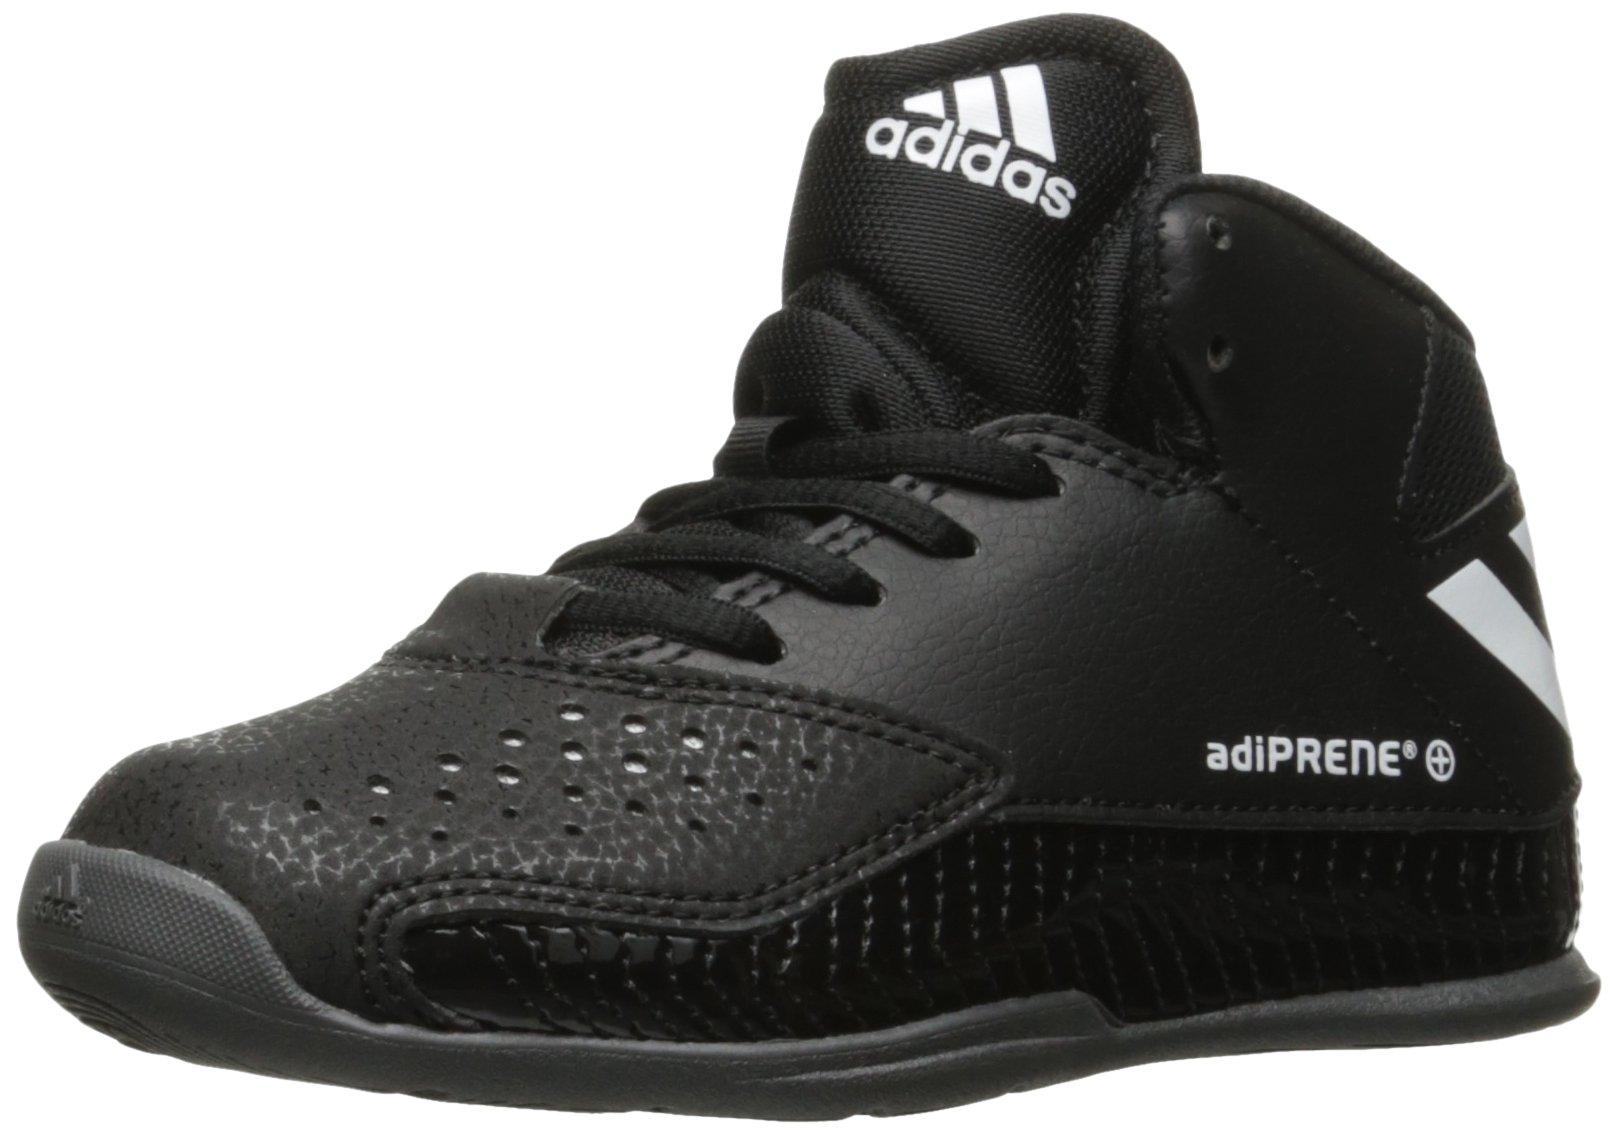 adidas Performance Boys' Nxt Lvl Spd V K Skate Shoe, Black/White/Dark Grey Heather, 3 M US Little Kid by adidas